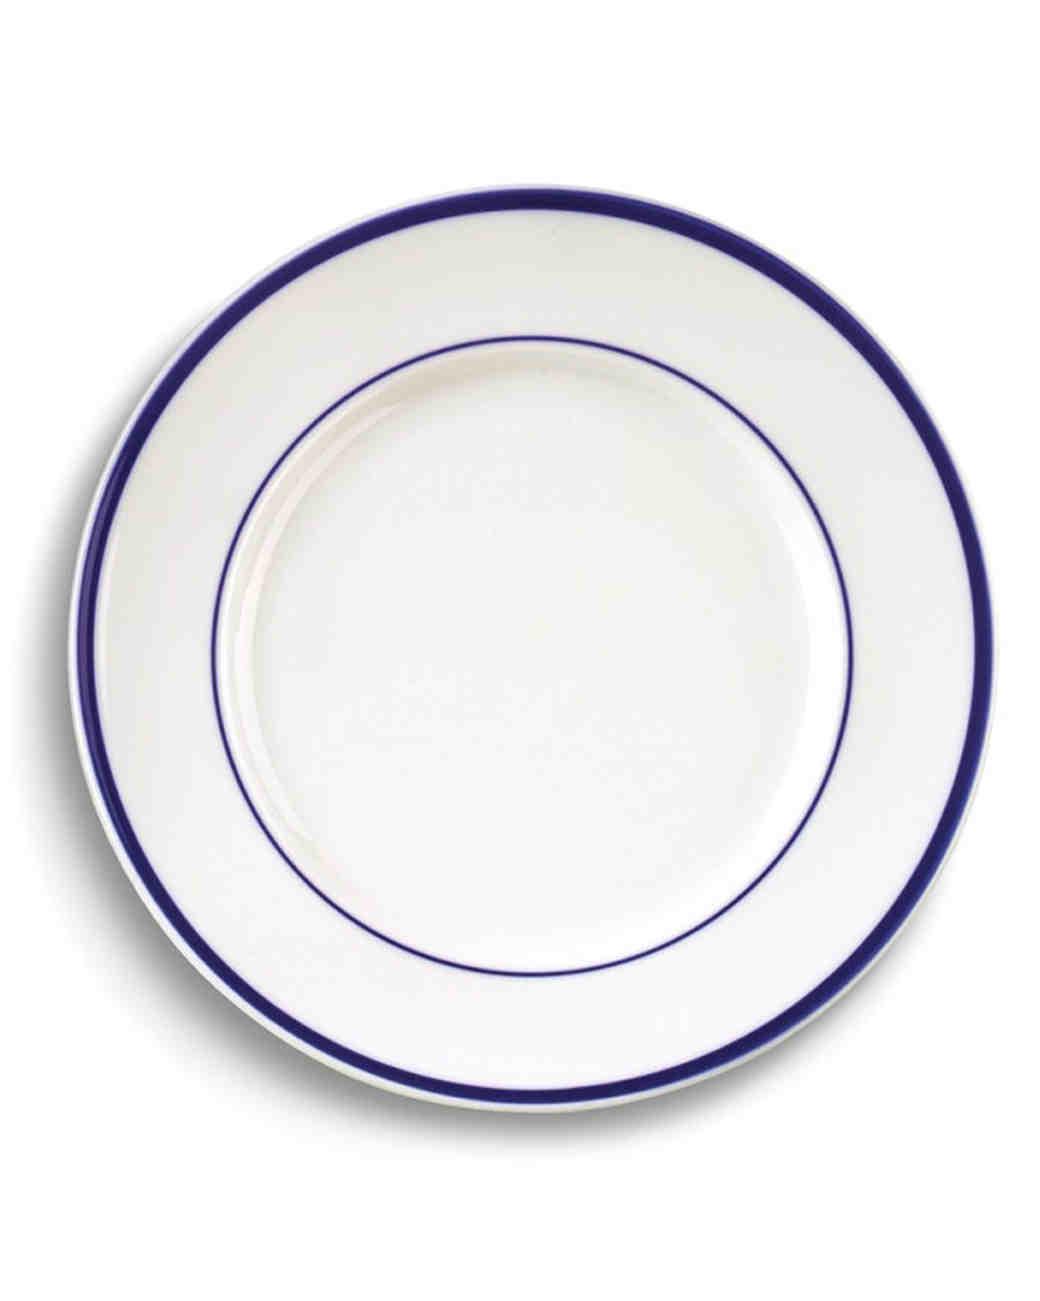 china-registry-classics-williams-sonoma-blue-plate-1014.jpg